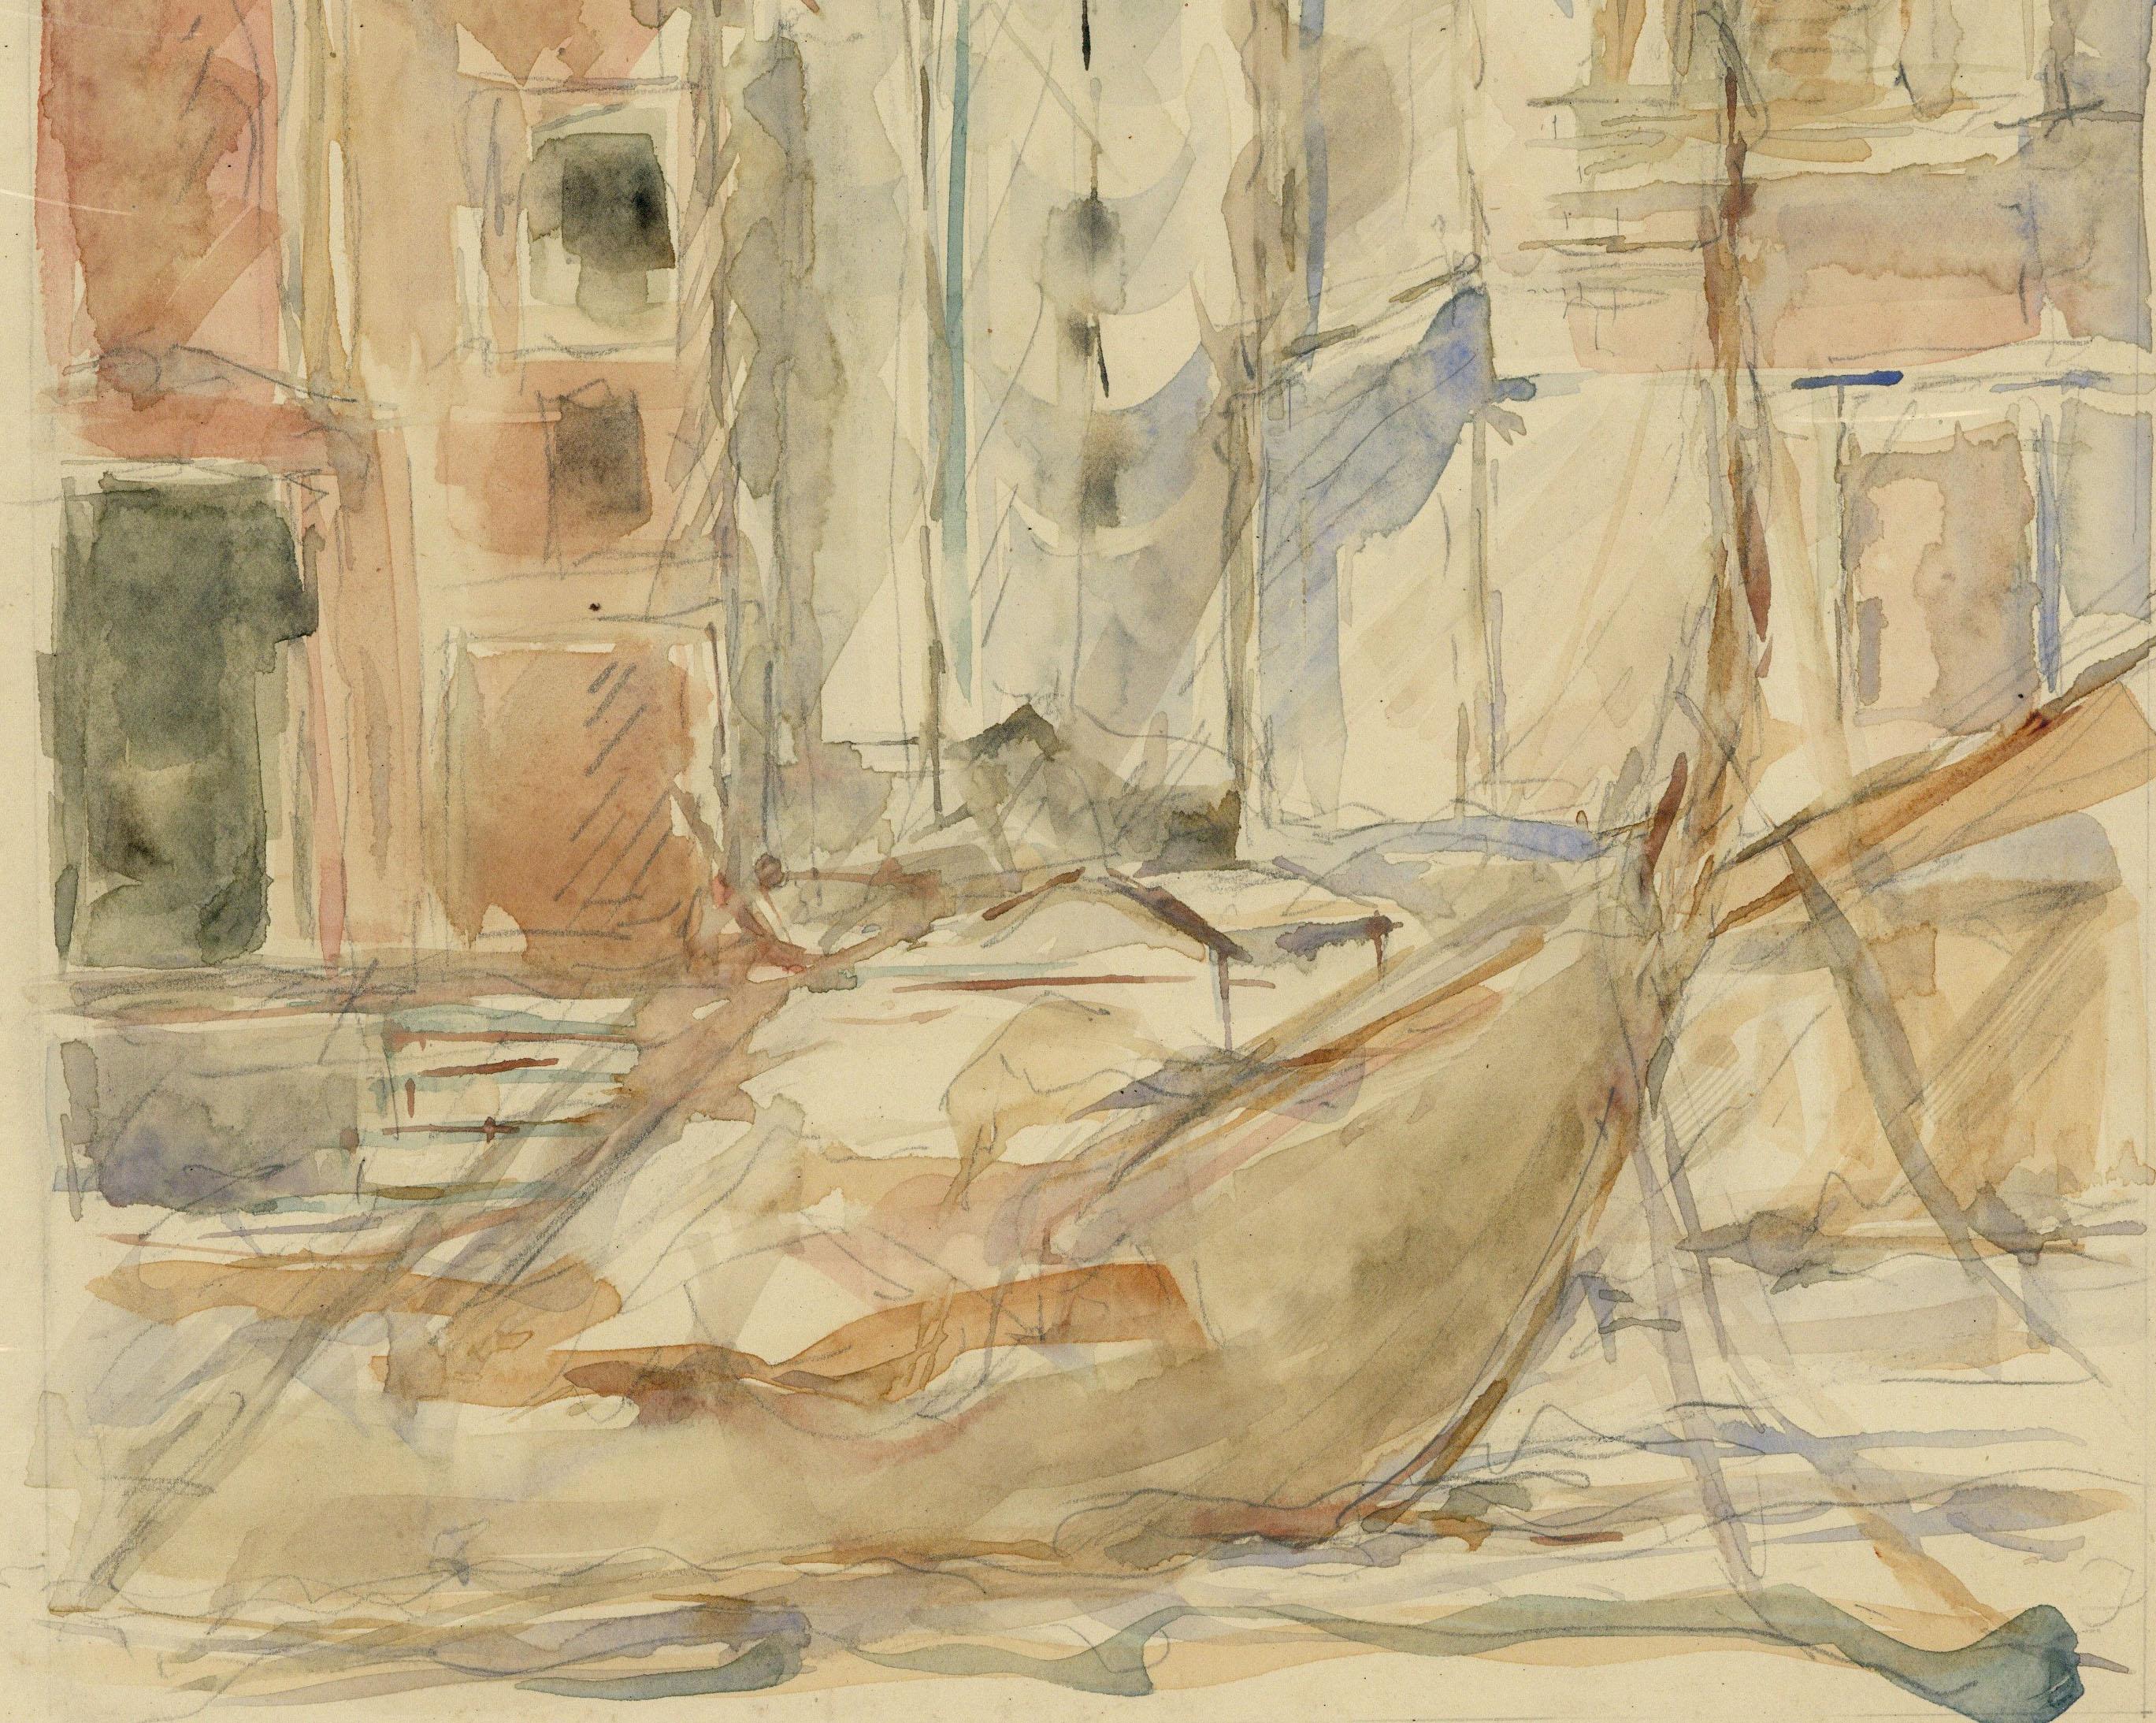 Pre-Raphaelite Drawing of a Gondola with Venetian Cityscape, Venice, Italy